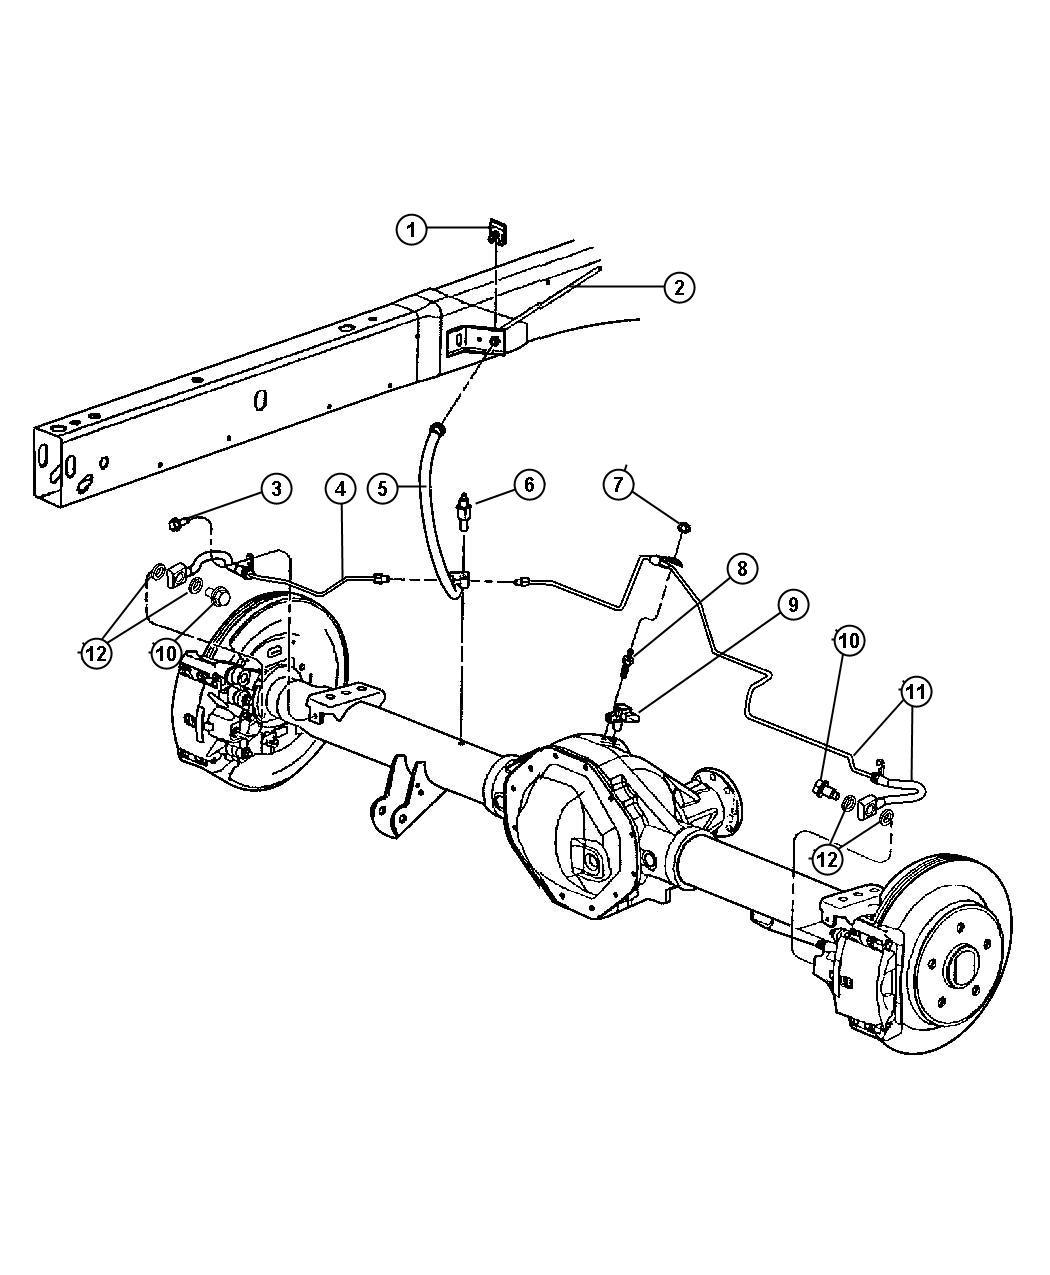 Dodge Ram Hose Brake Rear Anti Lock 4 Wheel Disc